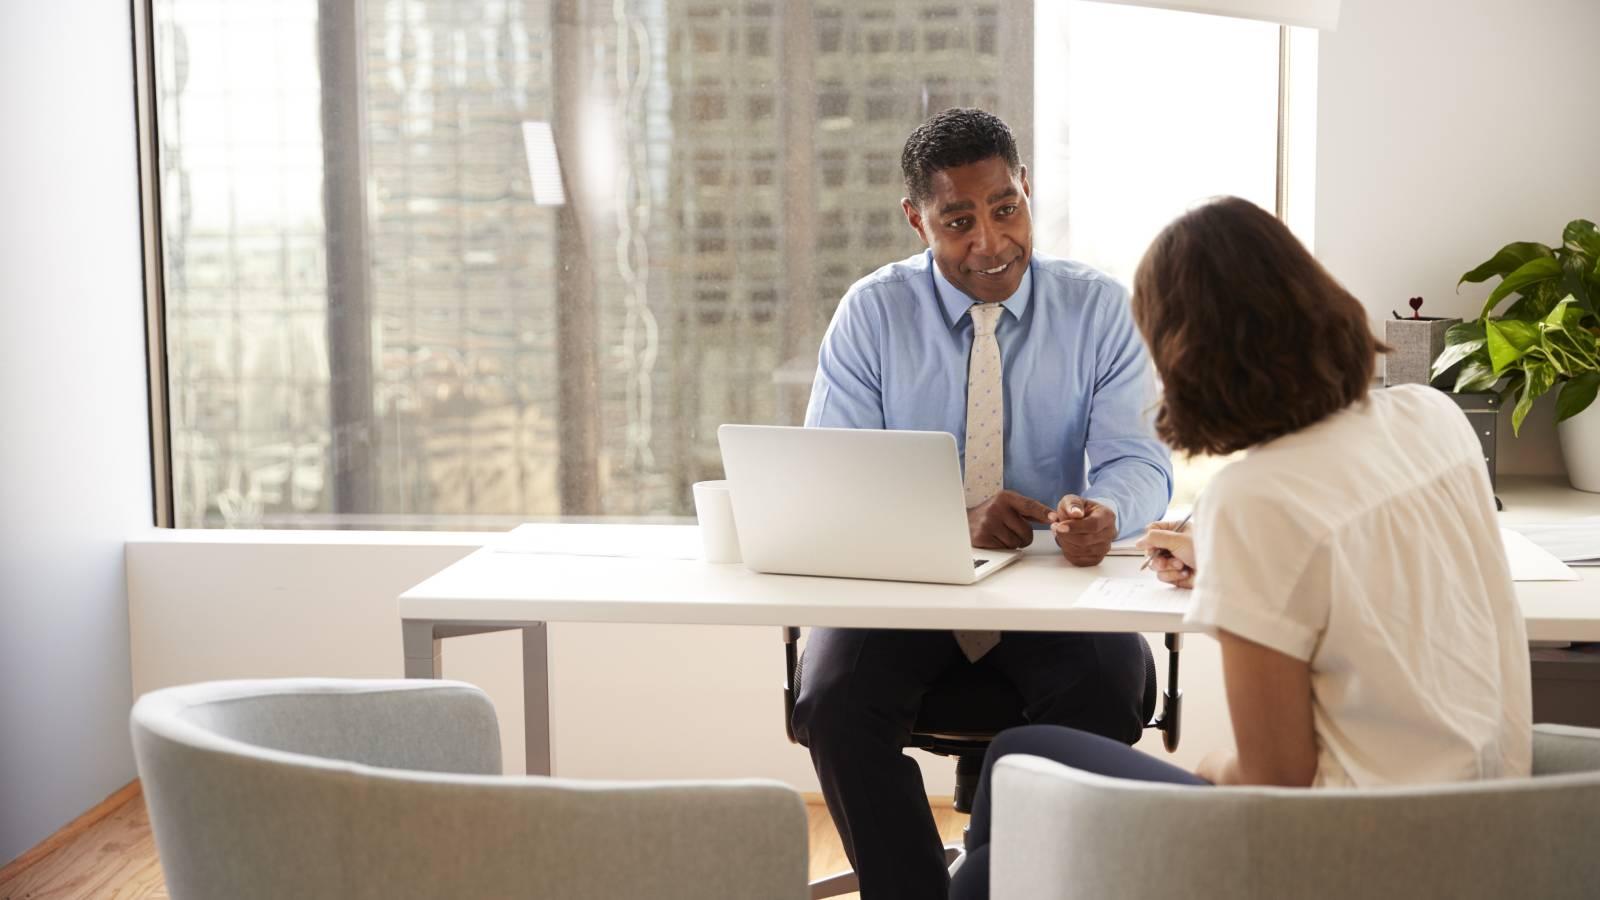 Divorce Financial Planning: 5 Key Tips For Divorcees | Bay Point Wealth